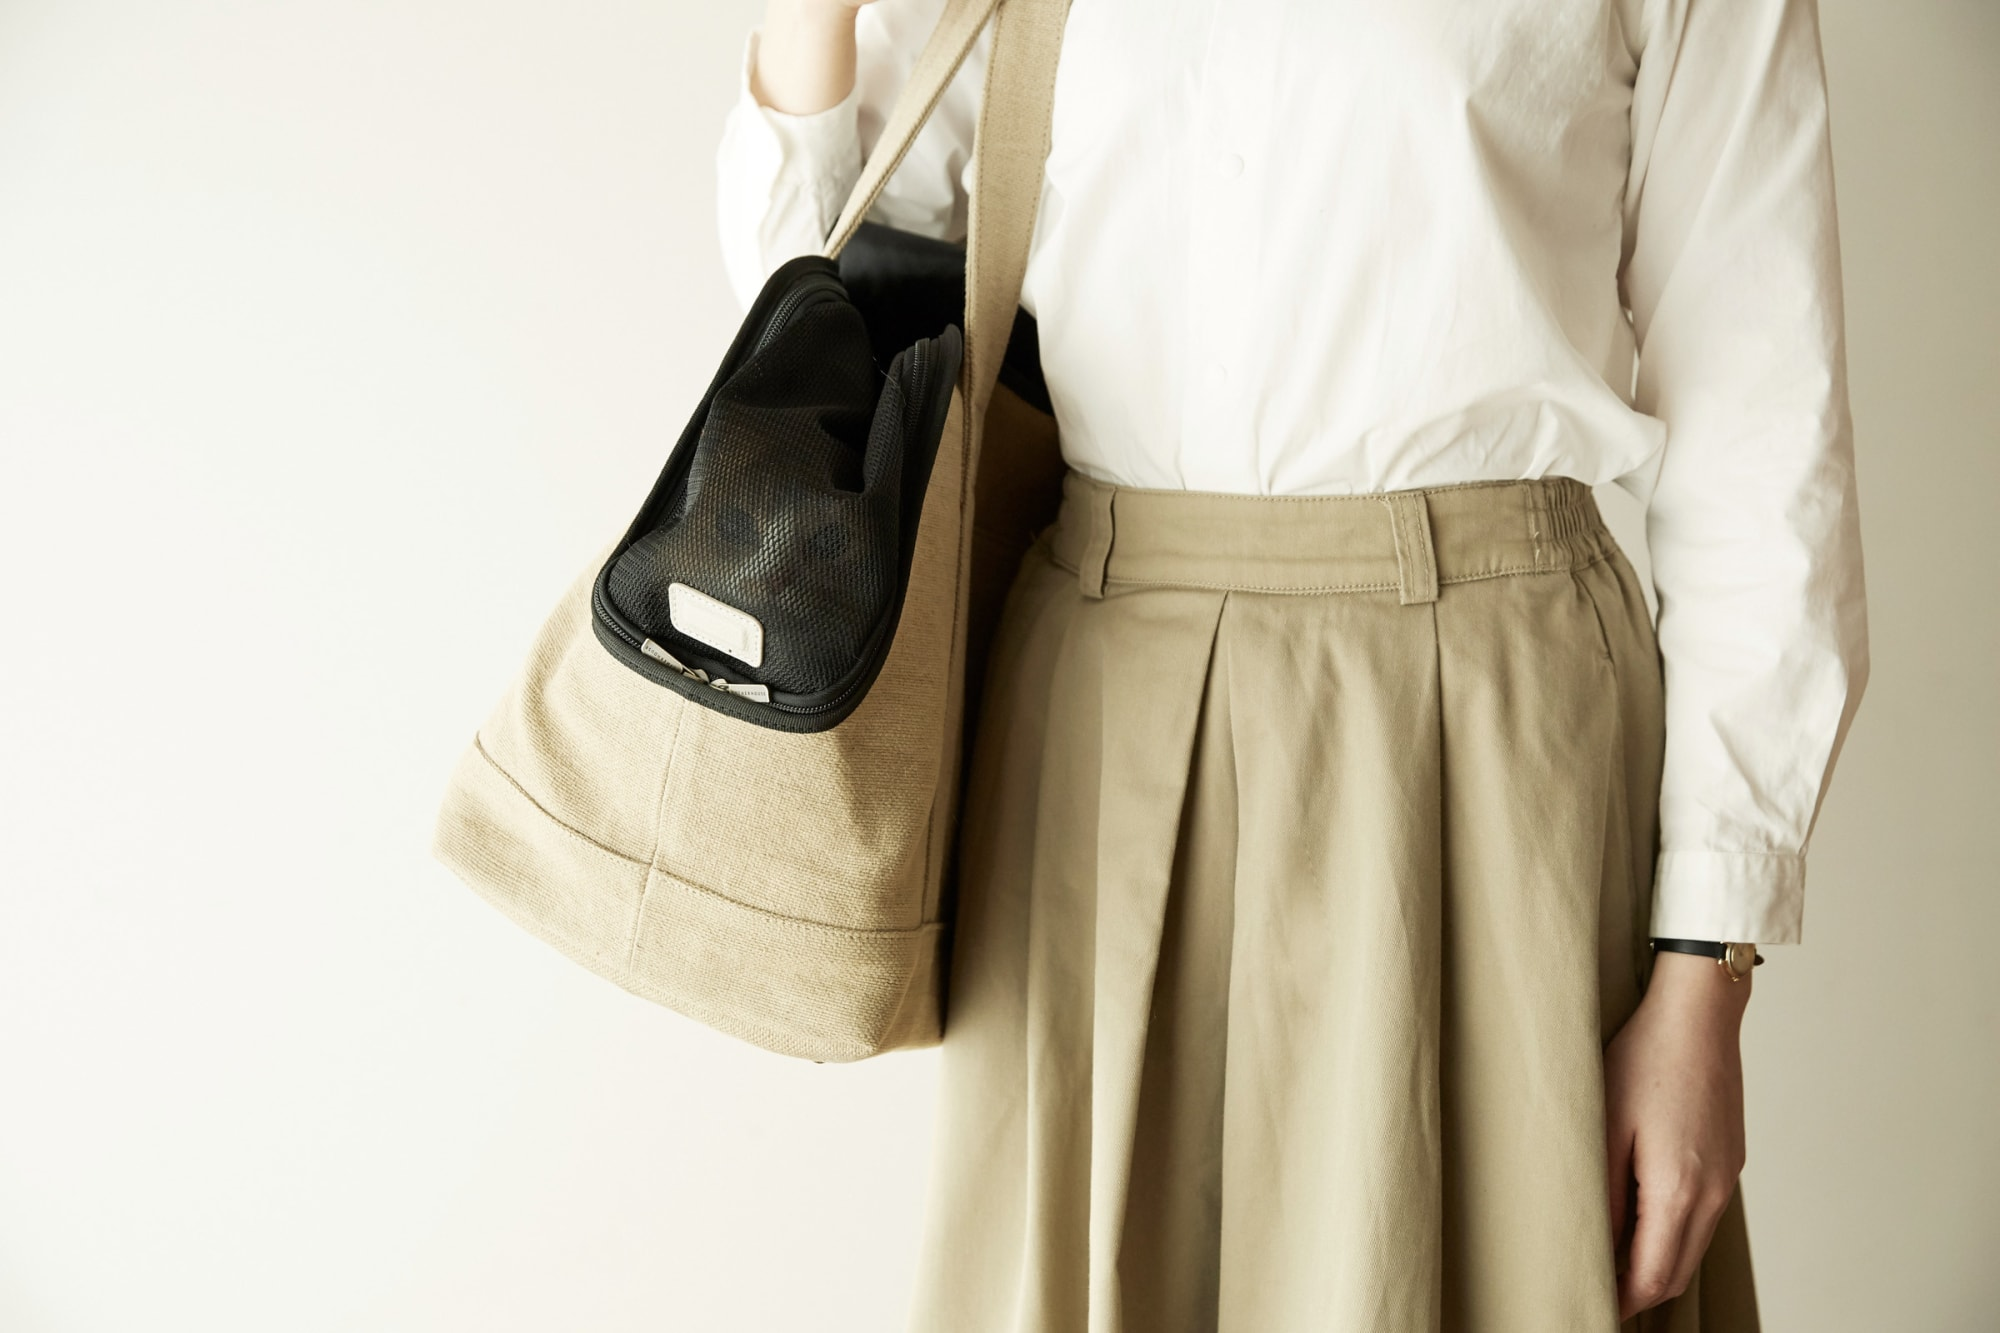 rinn-motherhouse-bag_003